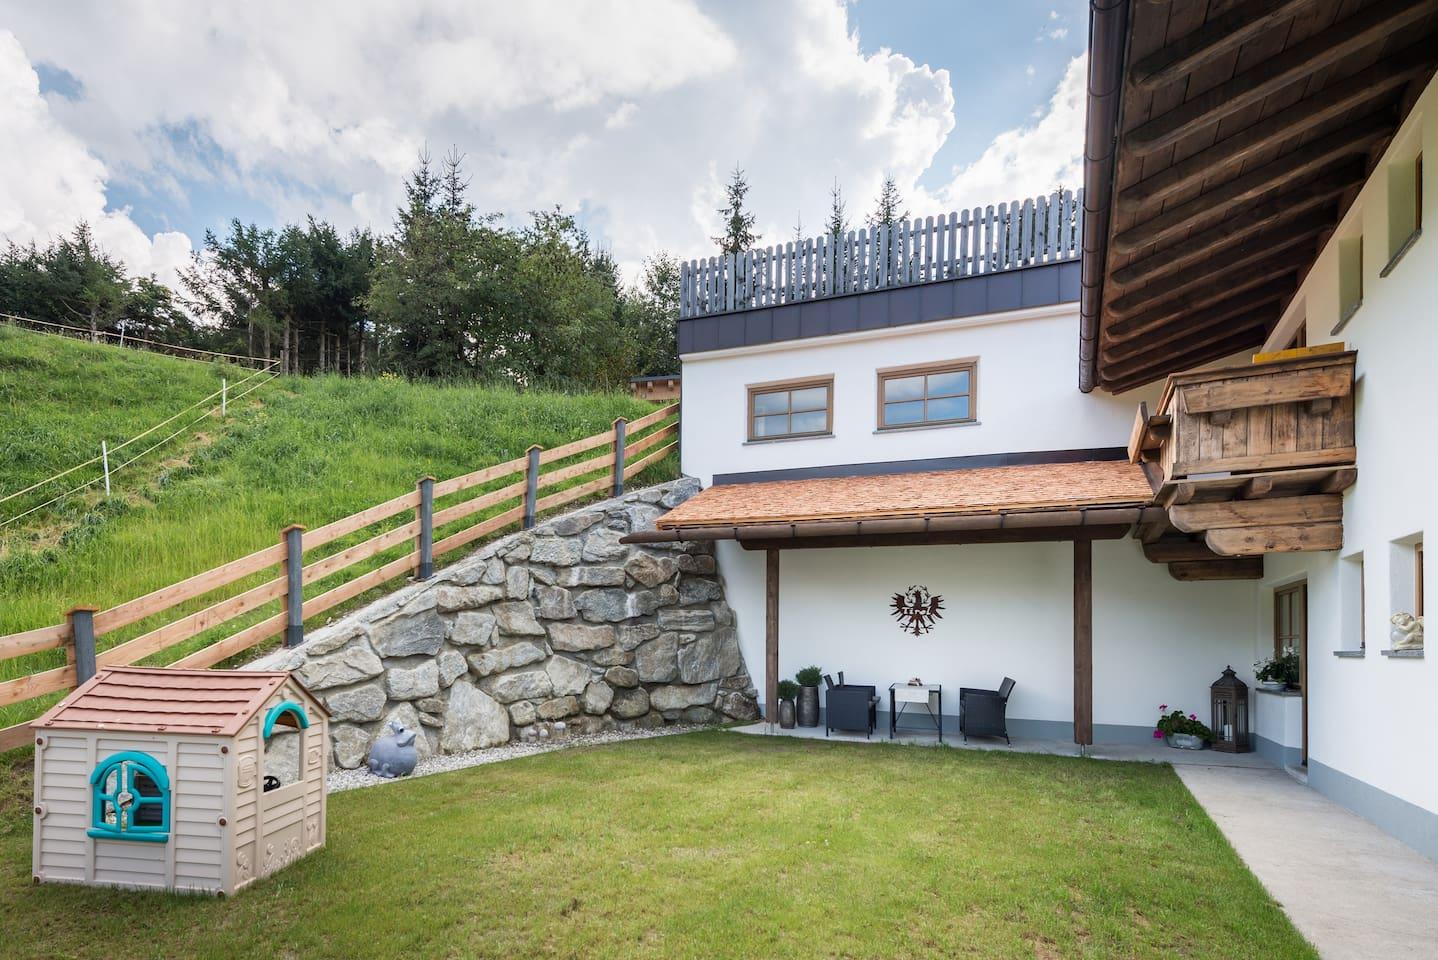 NInas Residenzal mit eigenem Garten 80 Quatratmeter